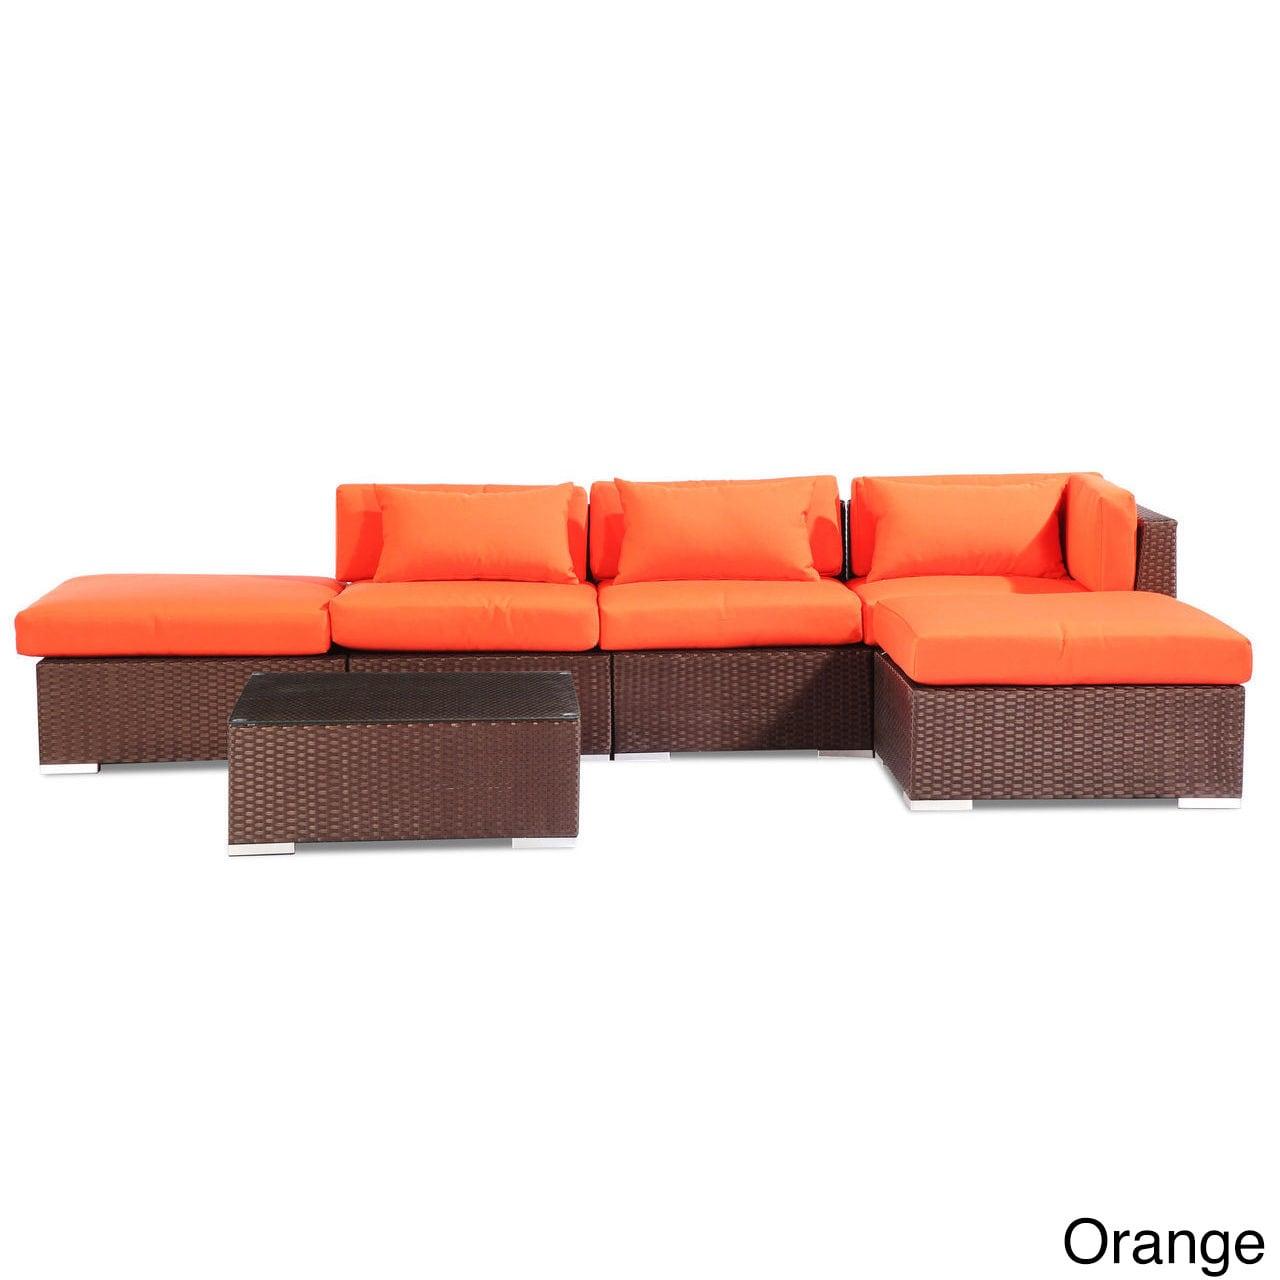 Modify-It Poipu 6-Piece Outdoor Patio Sofa Sectional Set ...